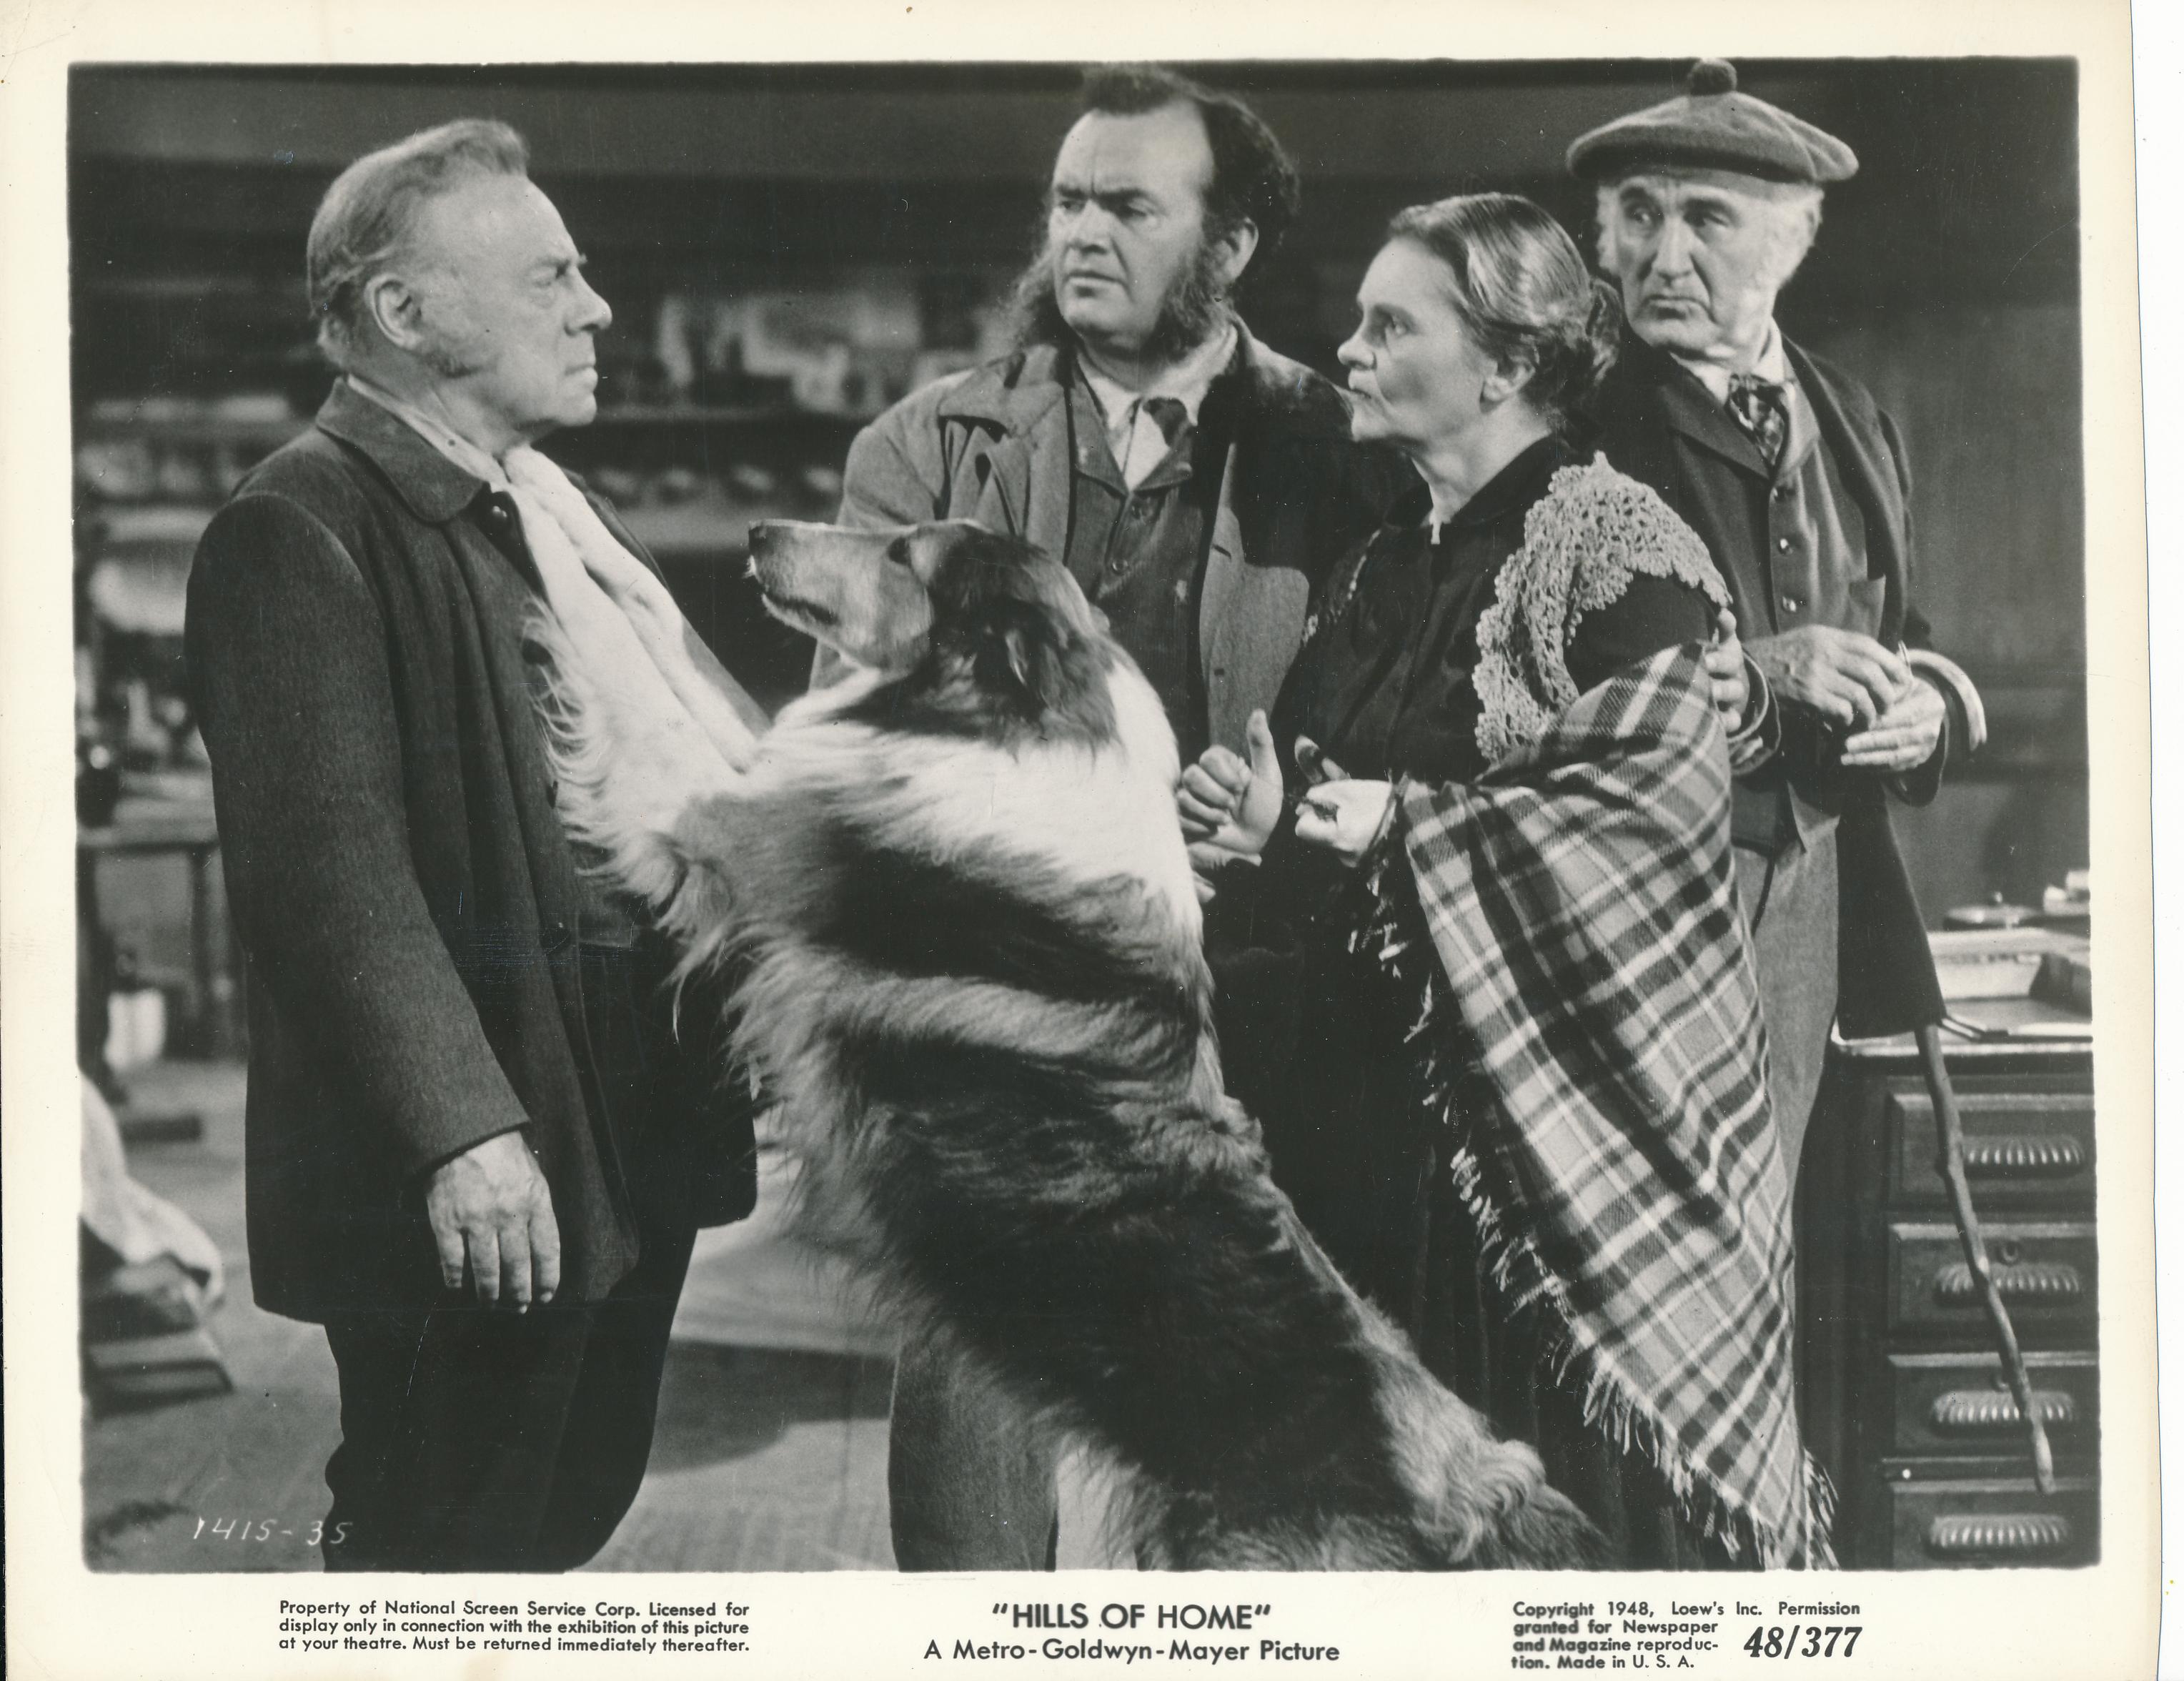 Edmund Gwenn, Rhys Williams, and Pal in Hills of Home (1948)